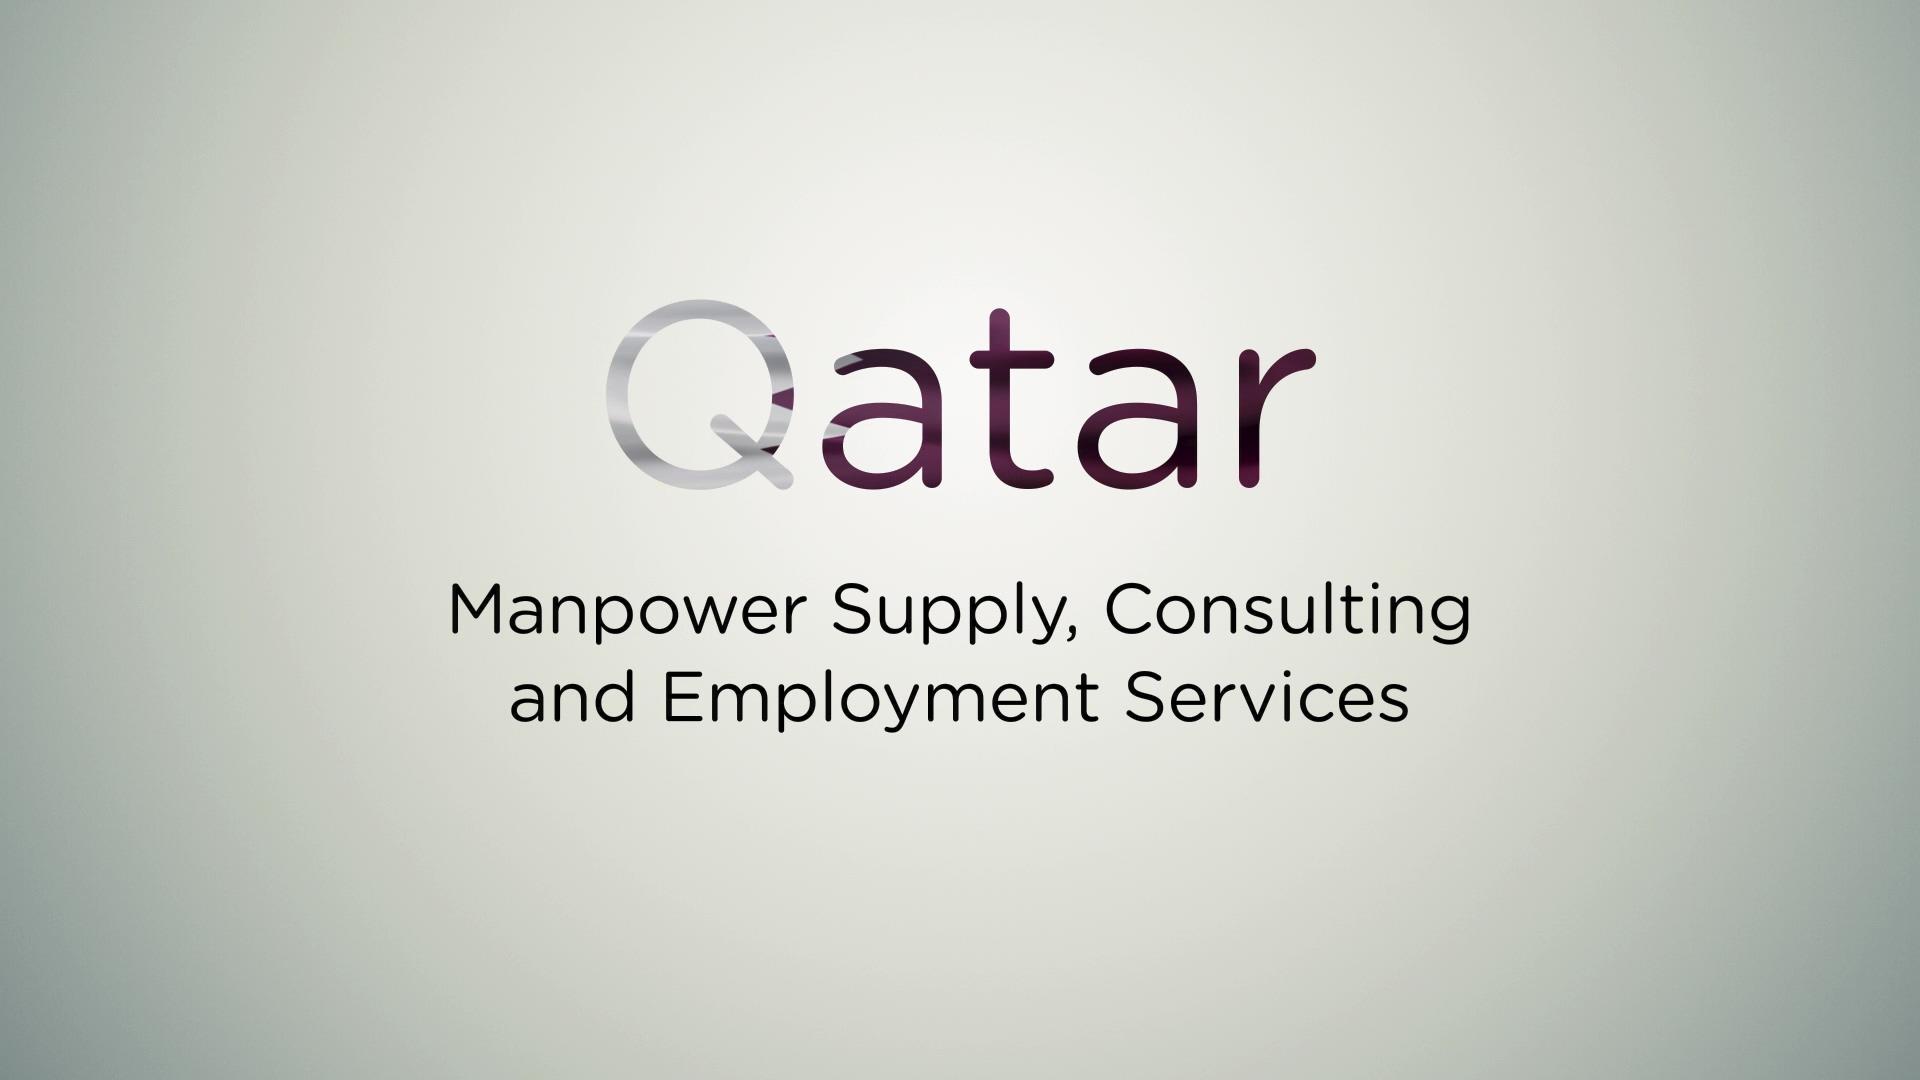 Qatar-SEO